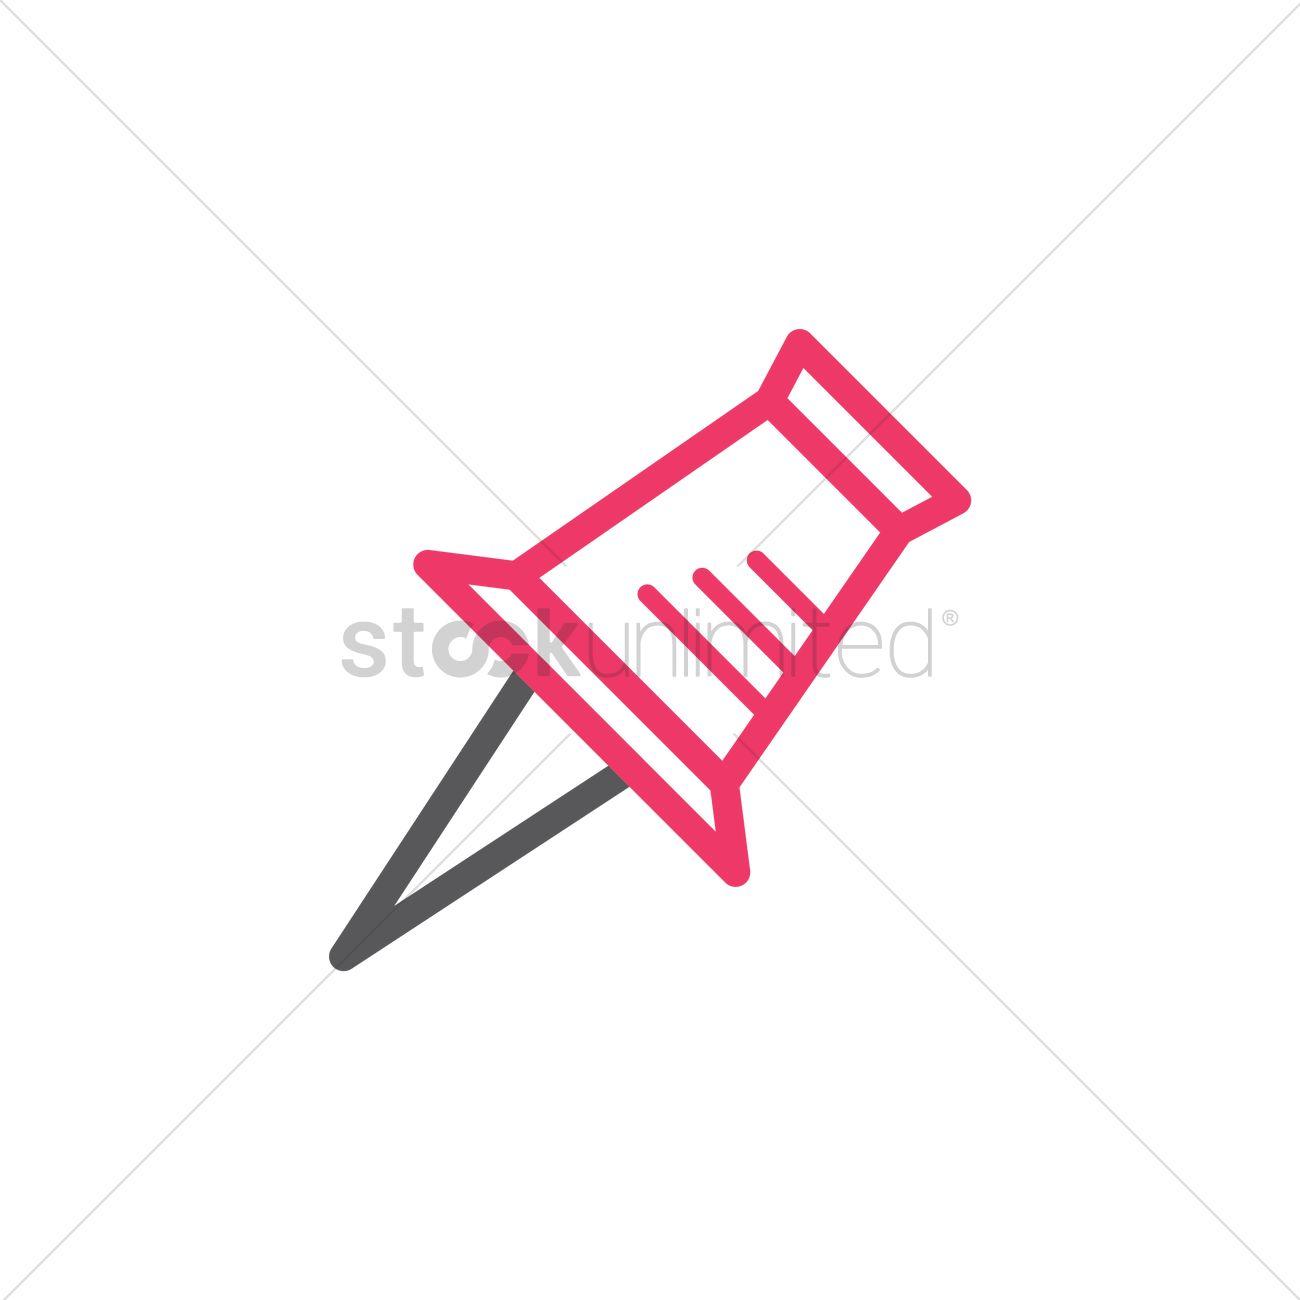 Push pin Vector Image - 1816977 | StockUnlimited